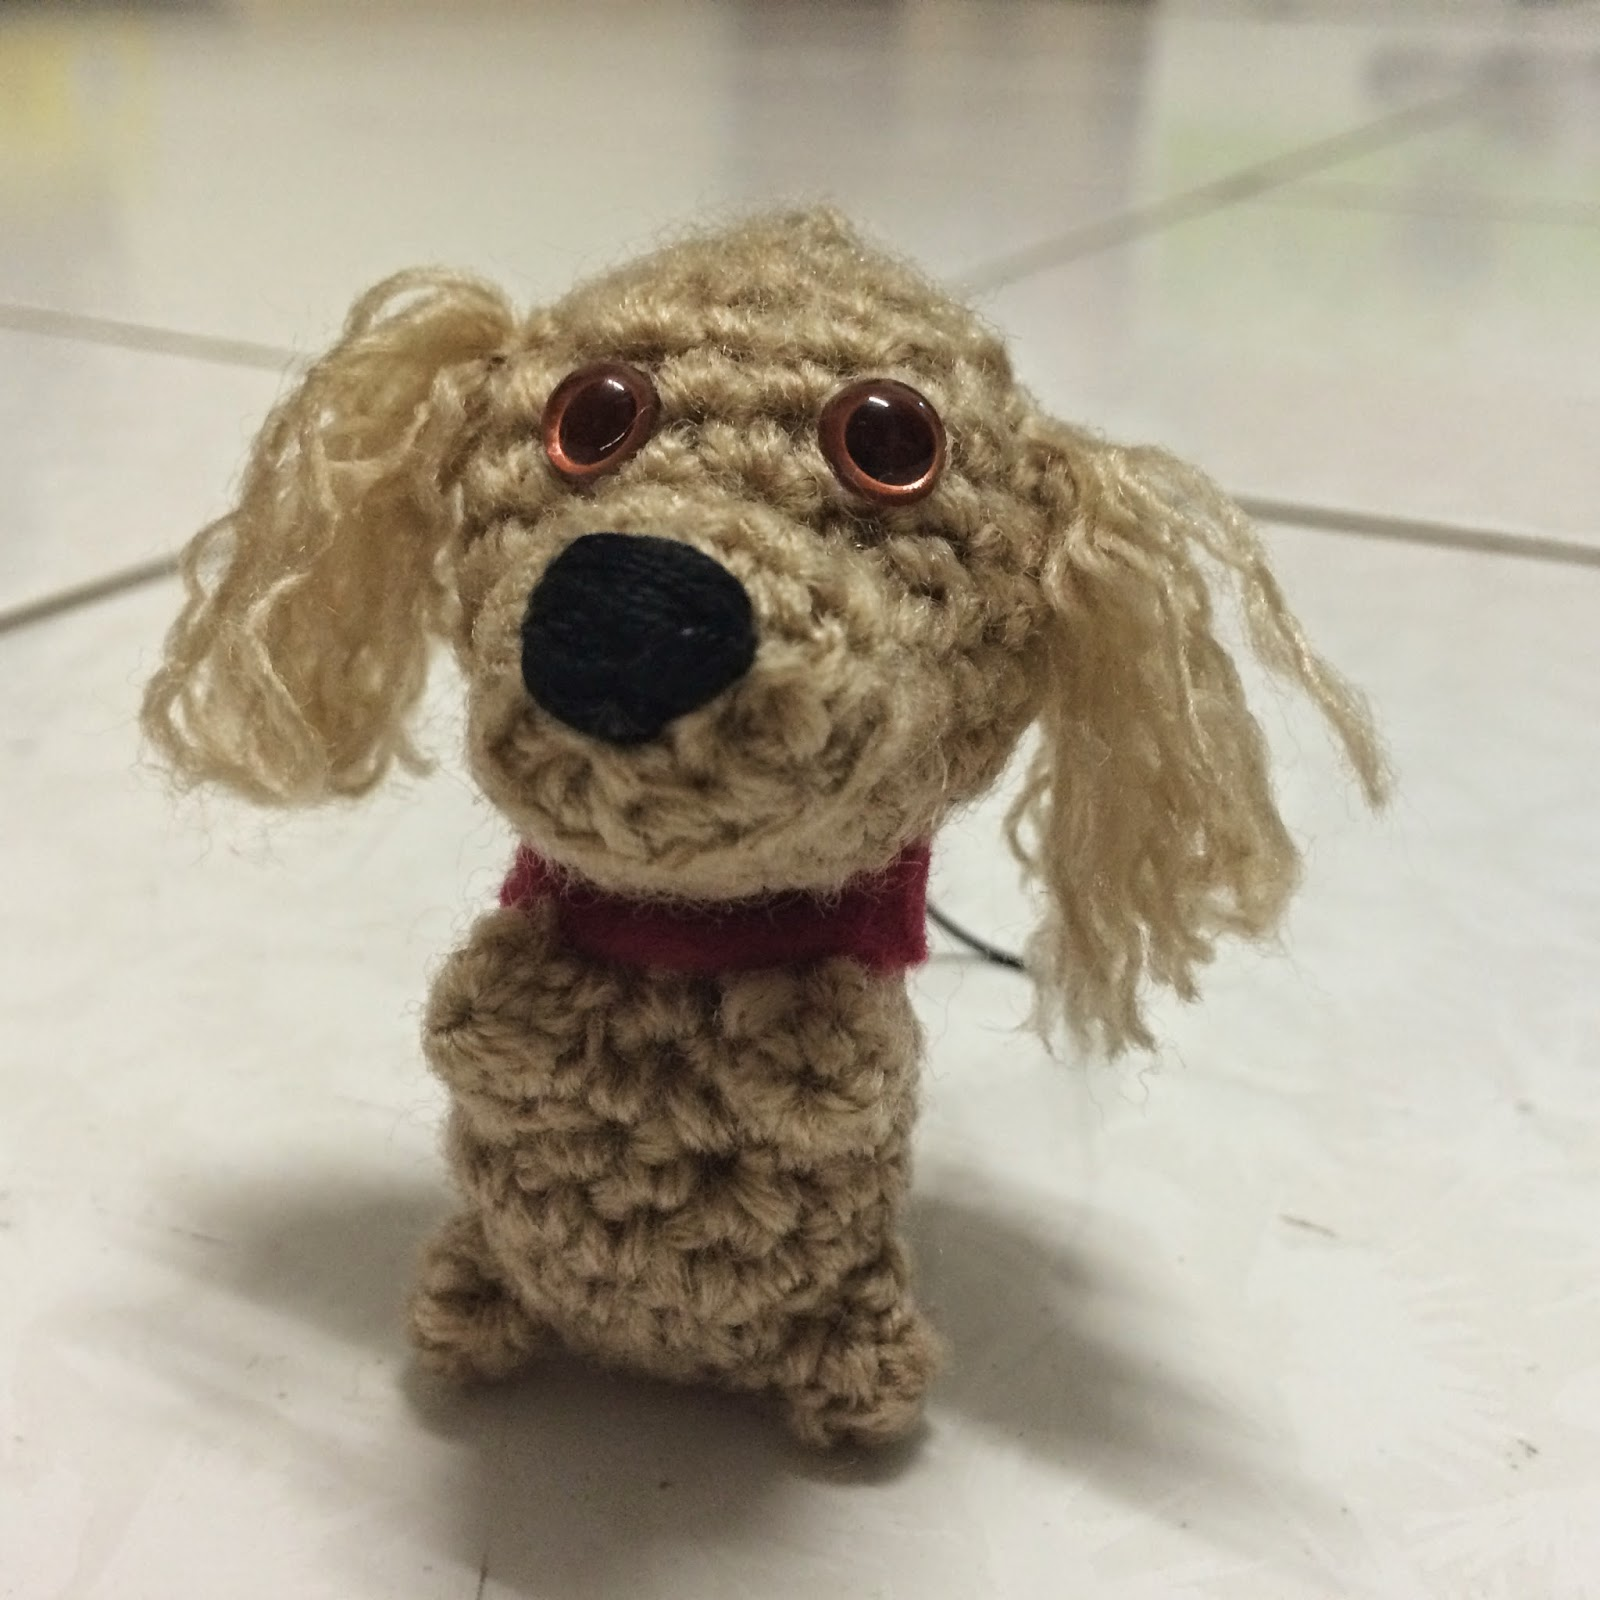 Free Amigurumi Poodle Pattern : Drunk with caffeine amigurumi pattern mini puppy key chain